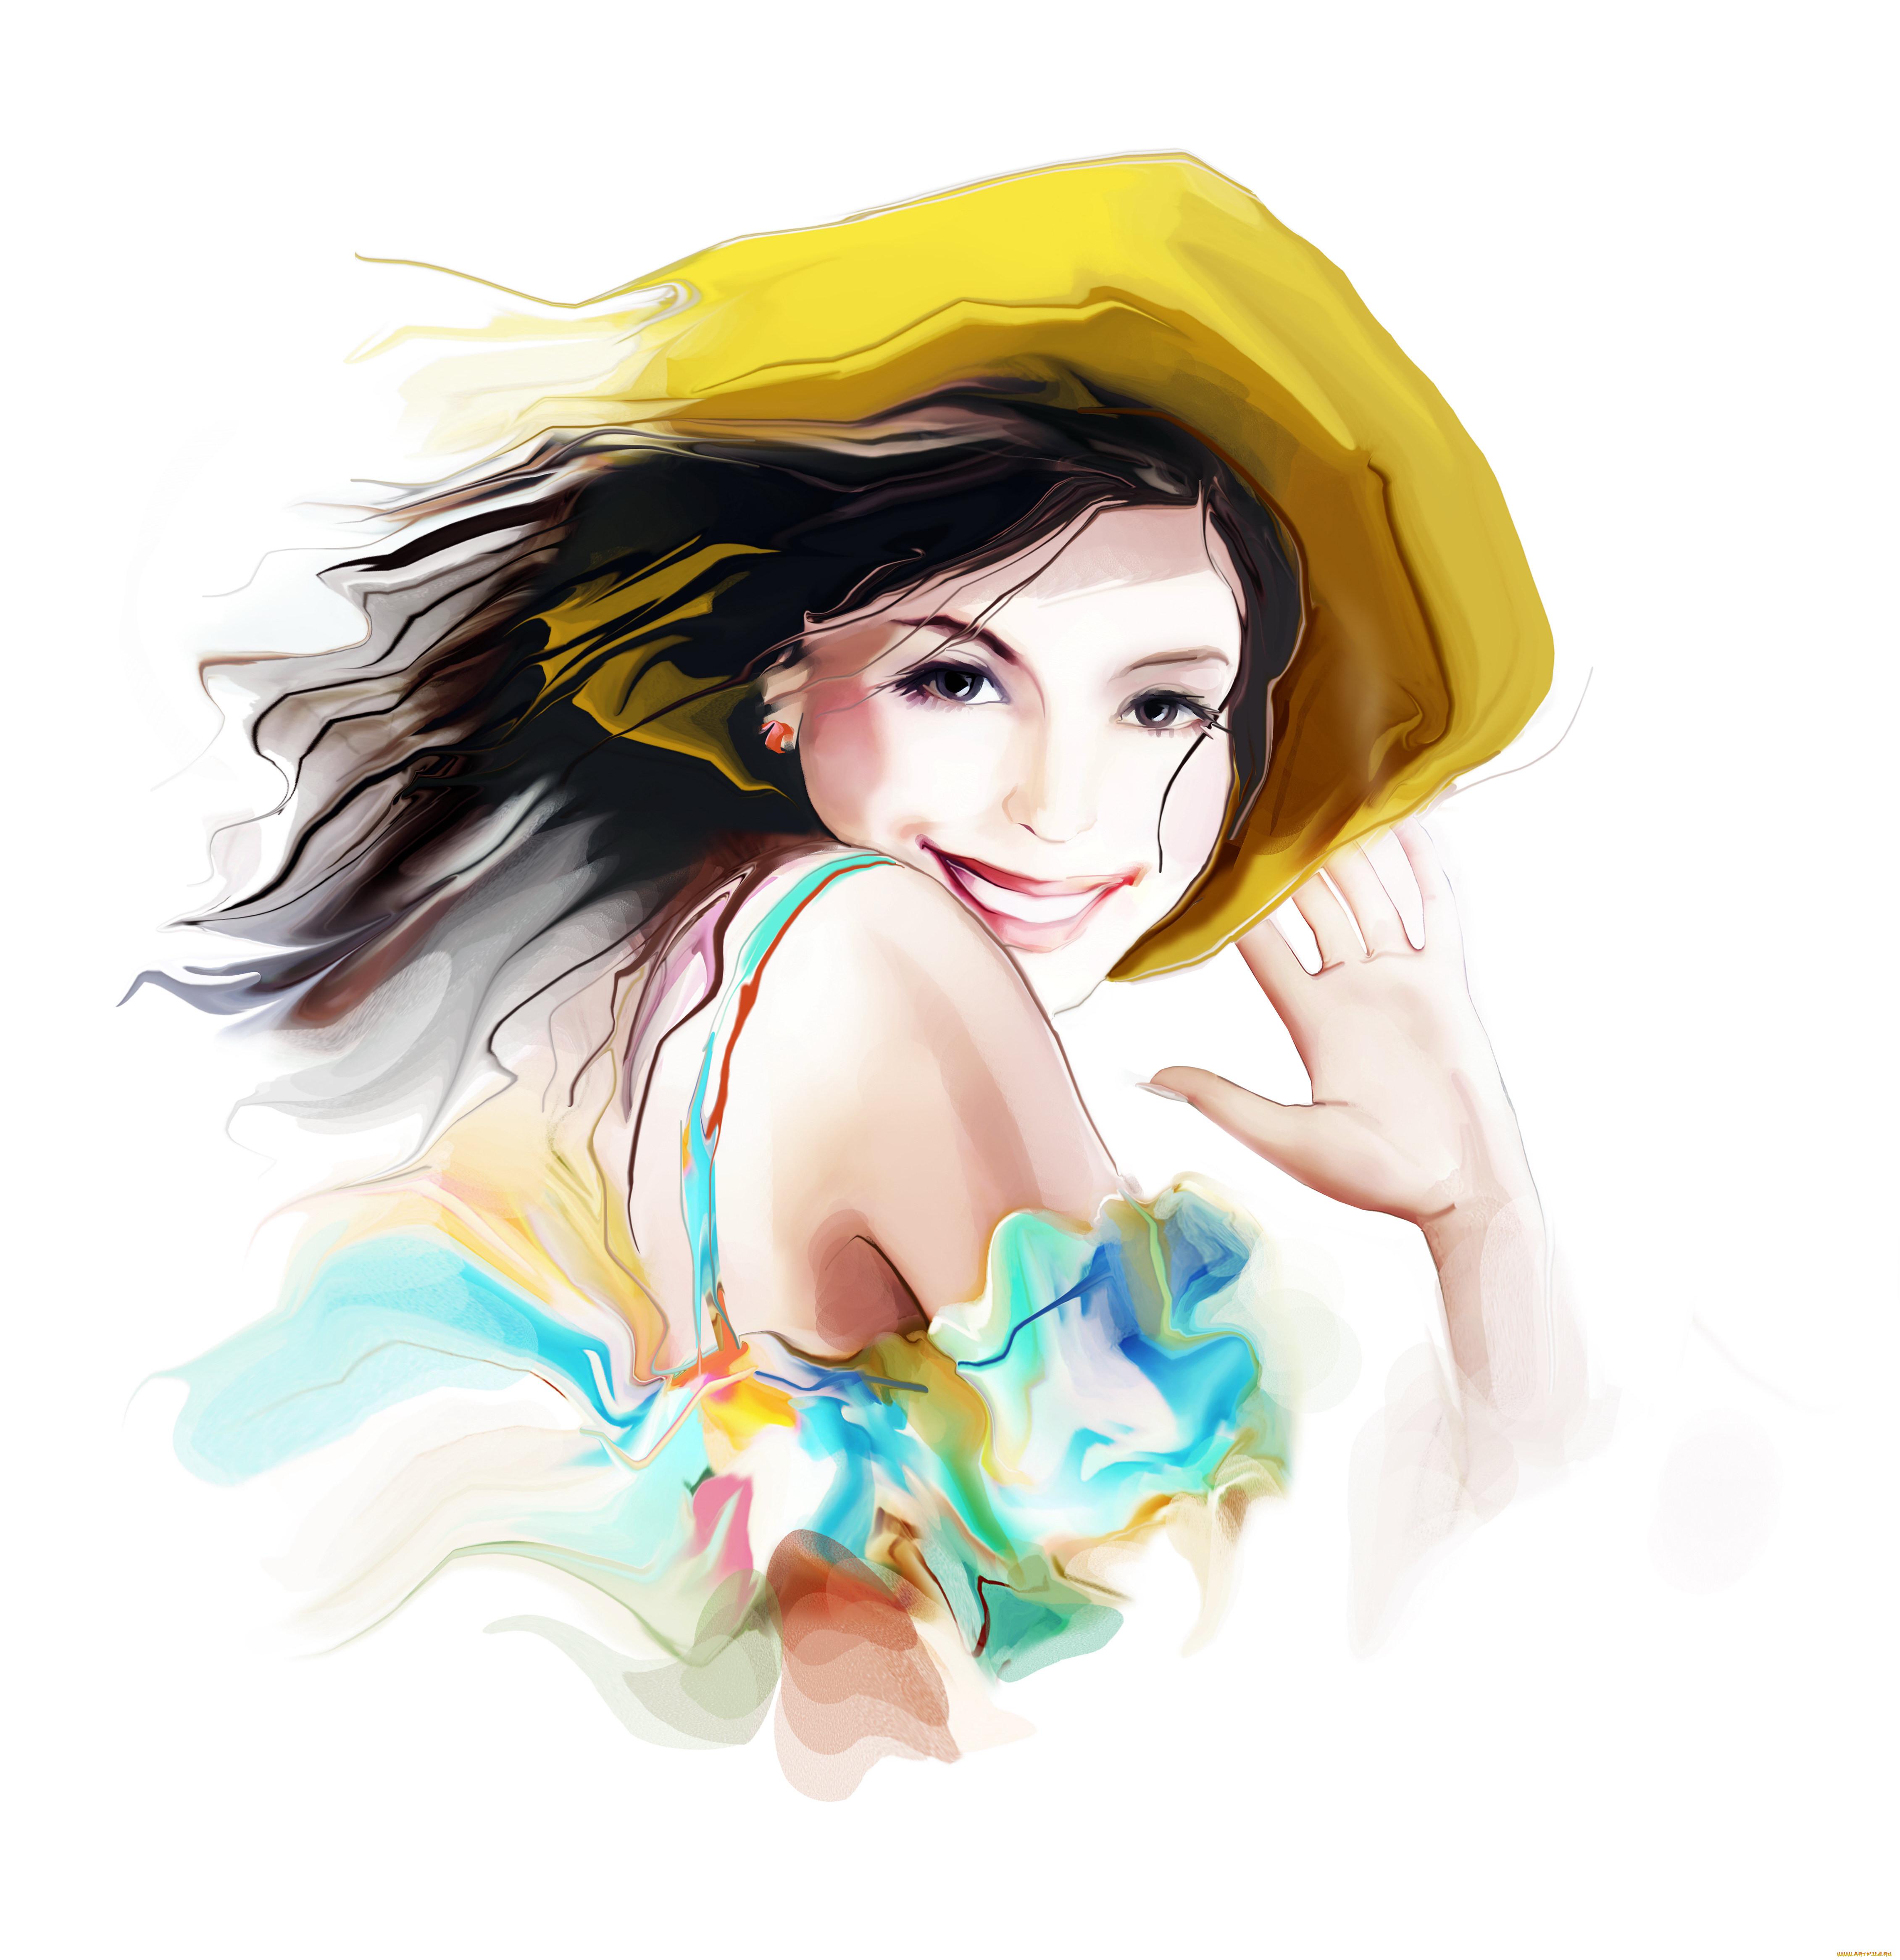 Картинка счастливая женщина рисунок